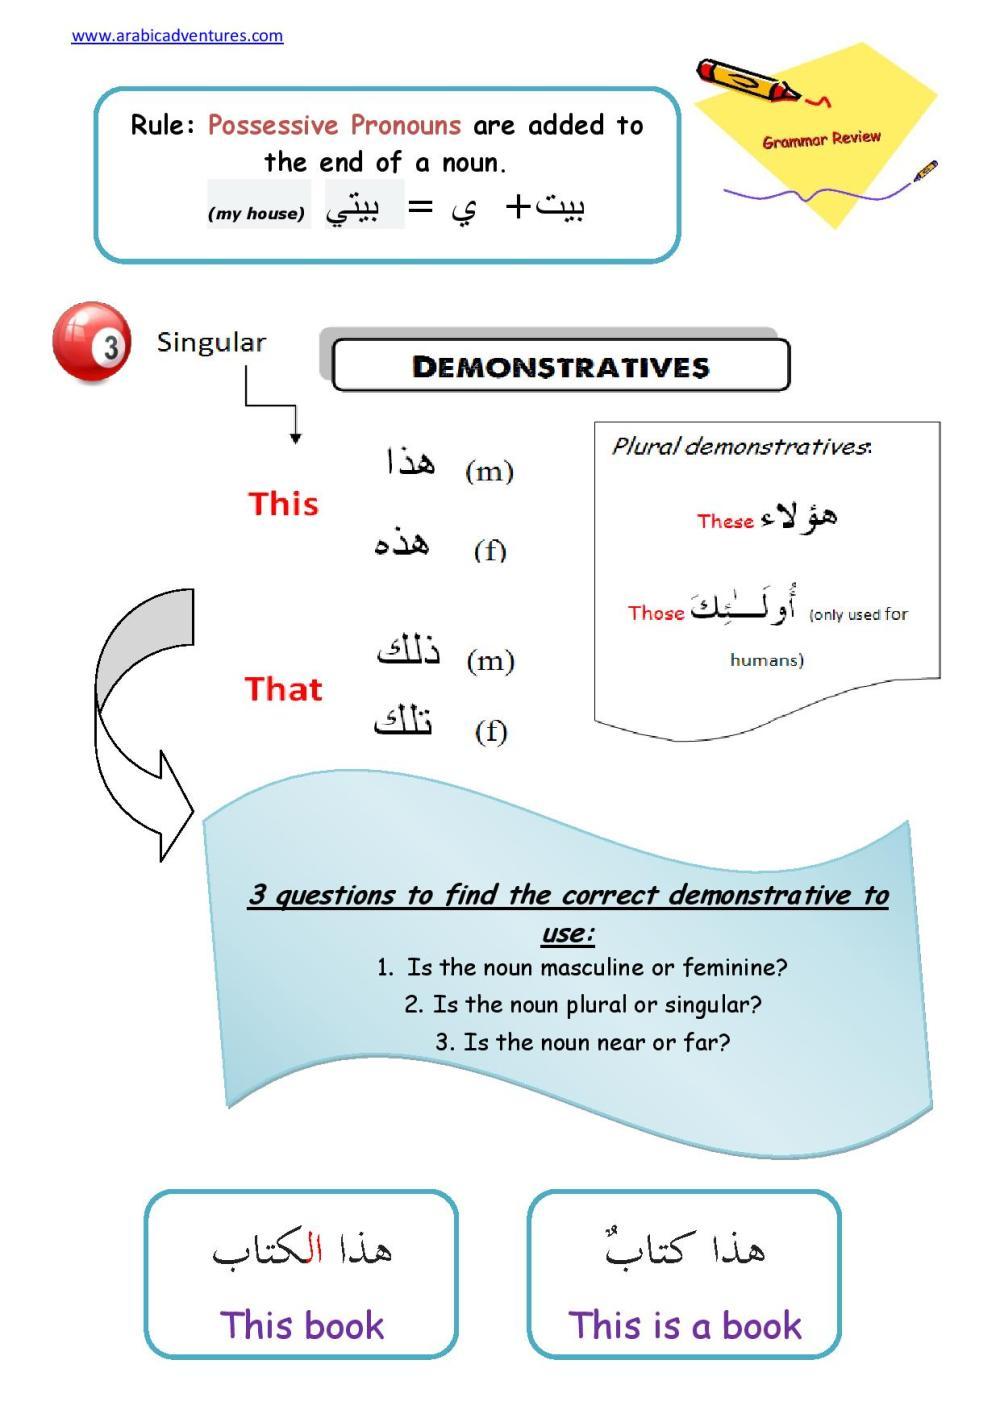 medium resolution of arabic pronouns   Arabic Adventures